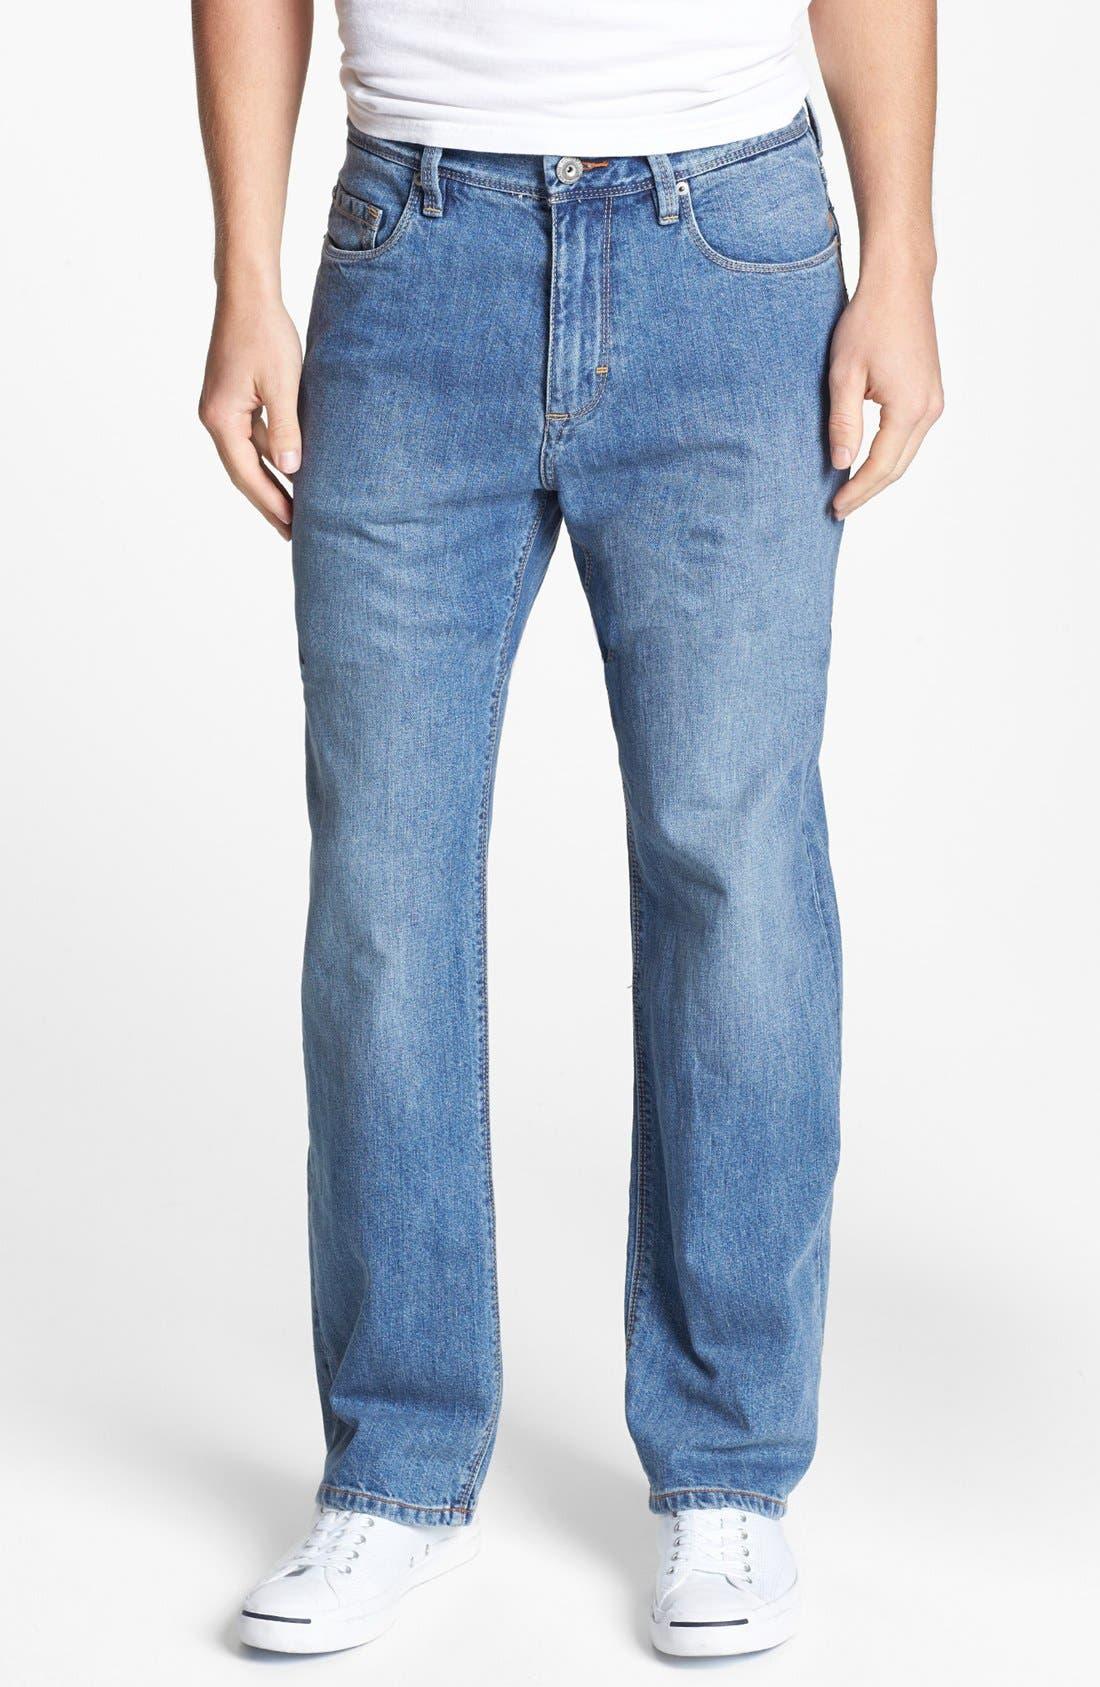 Main Image - Tommy Bahama Denim 'Stevie' Standard Fit Jeans (Beach)